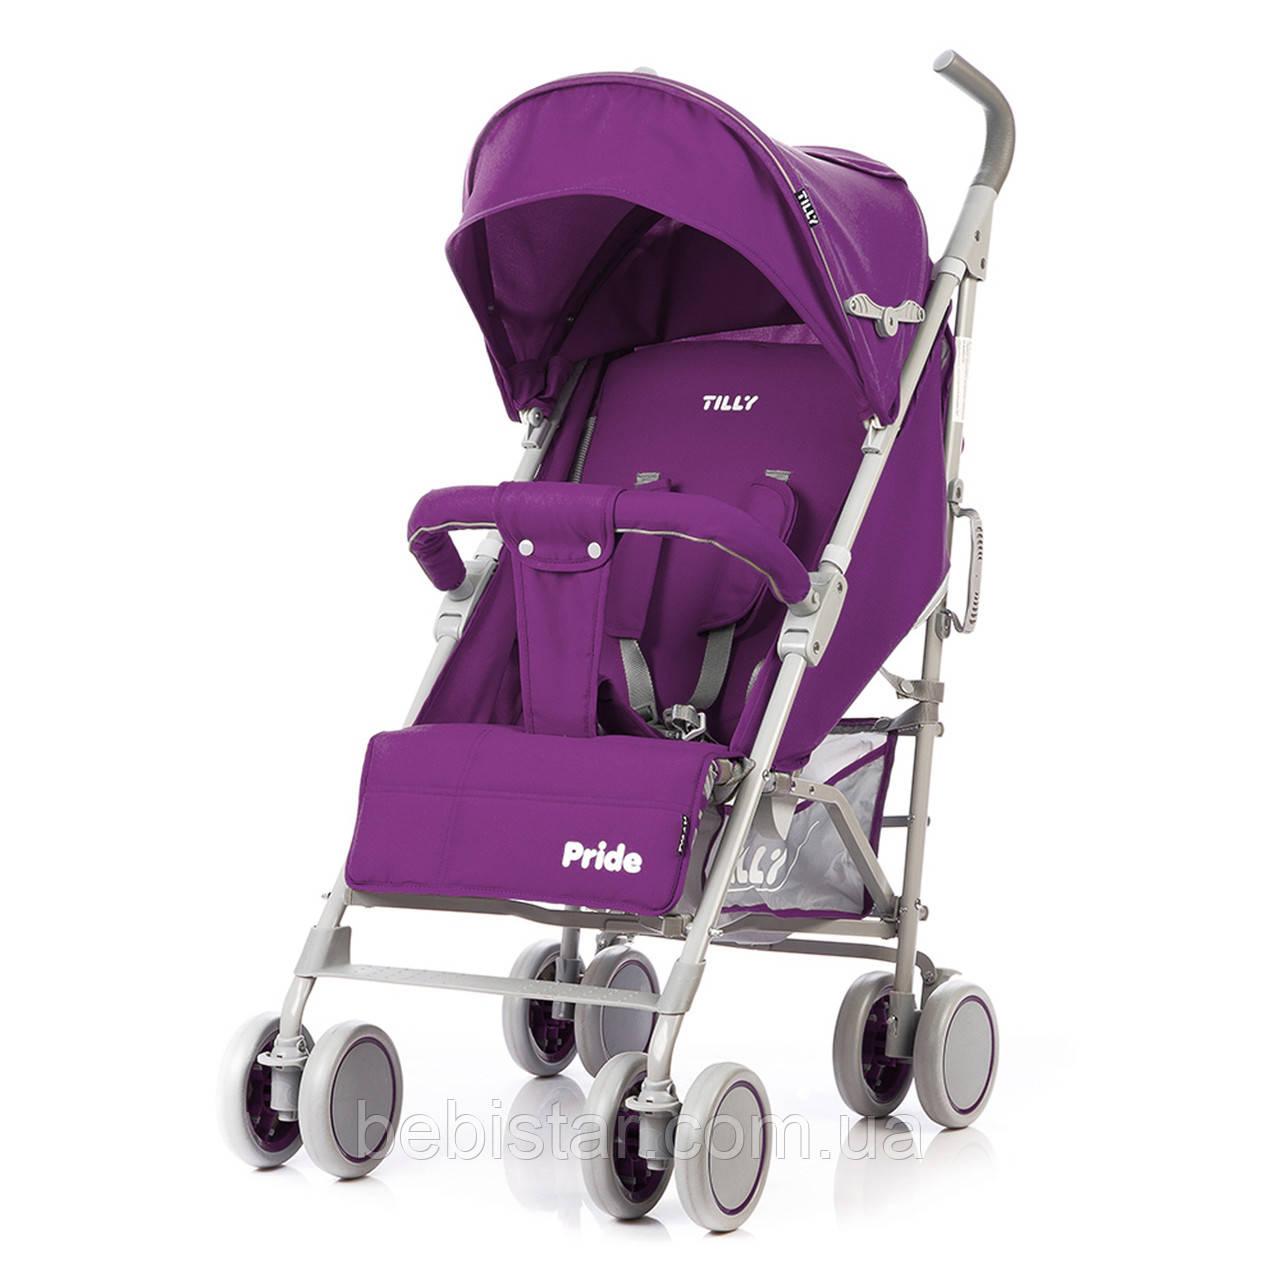 Дитяча прогулянкова коляска TILLY Pride T-1412 Purple